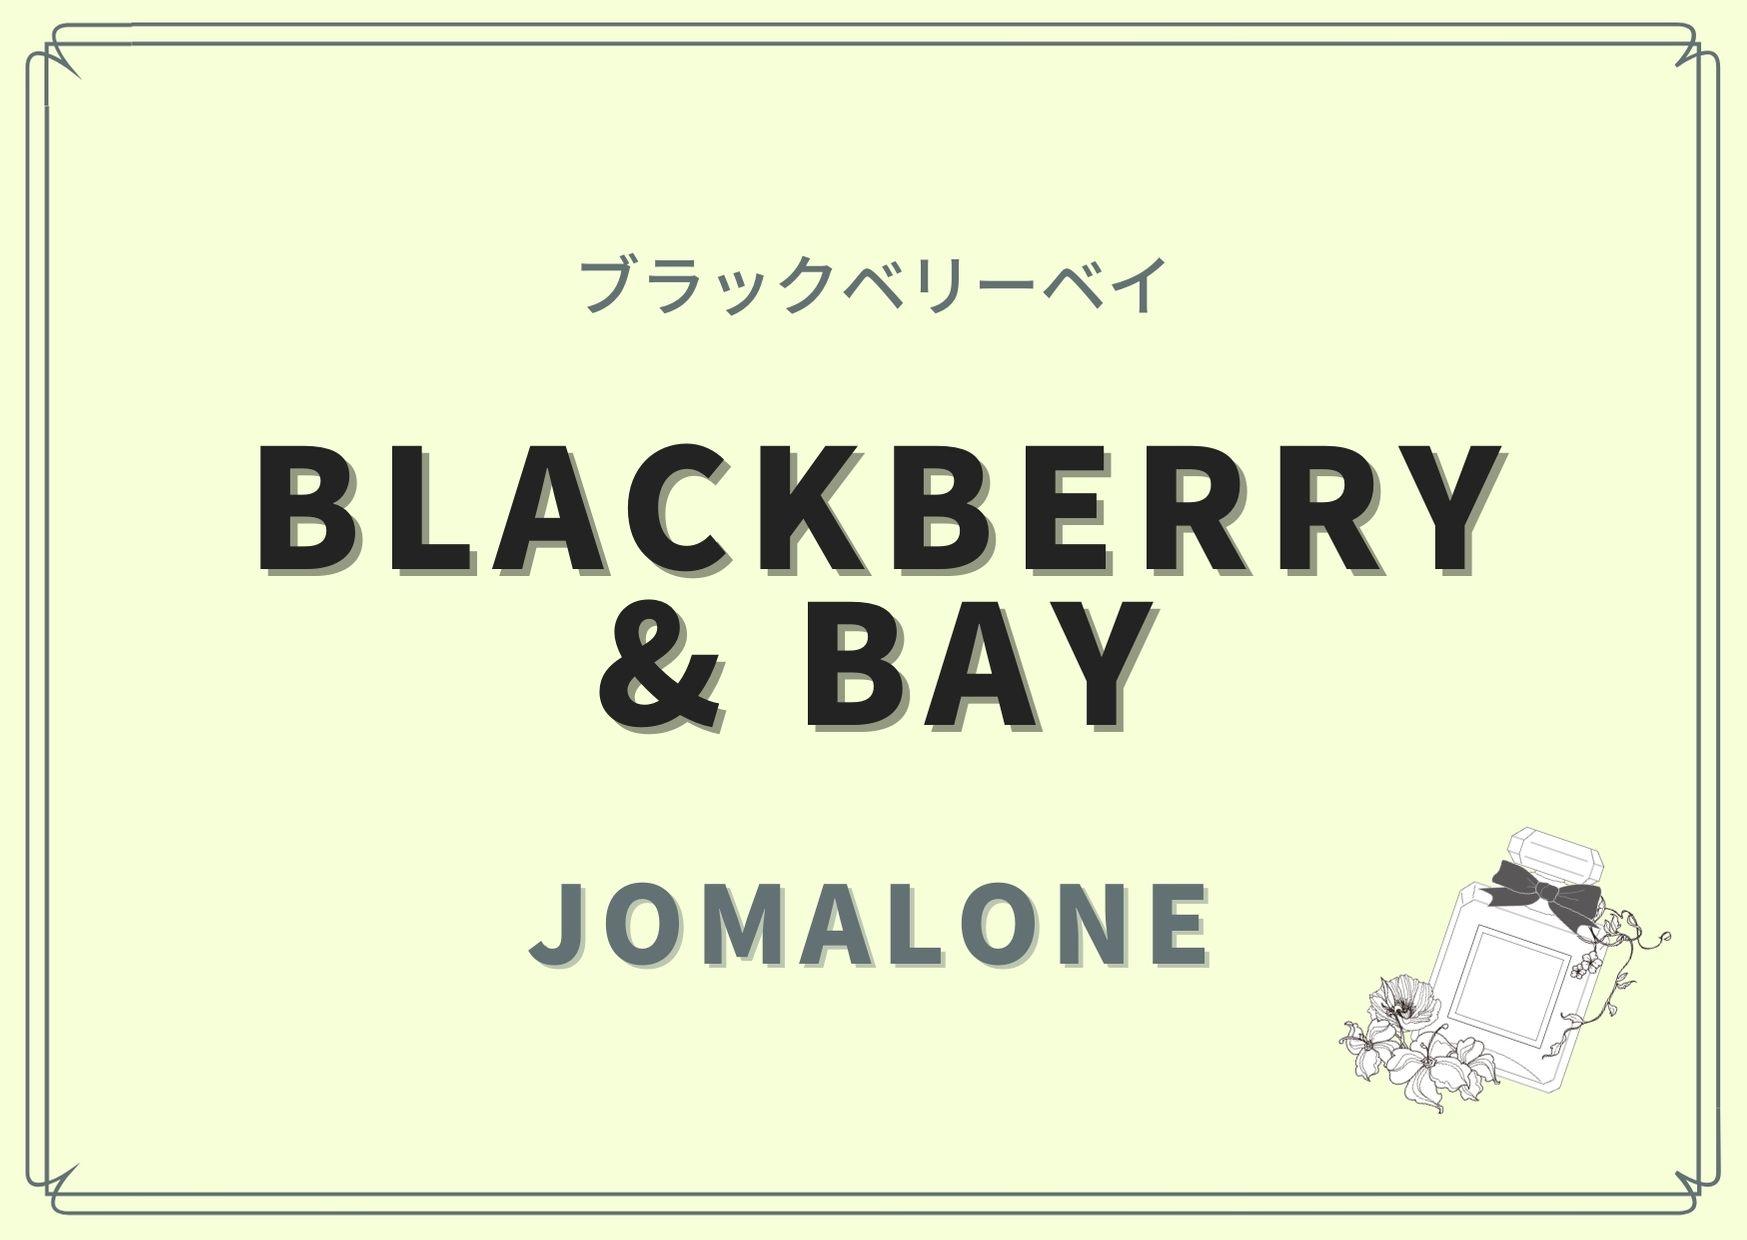 Blackberry & Bay(ブラックベリーベイ)/JoMalone(ジョーマローン)